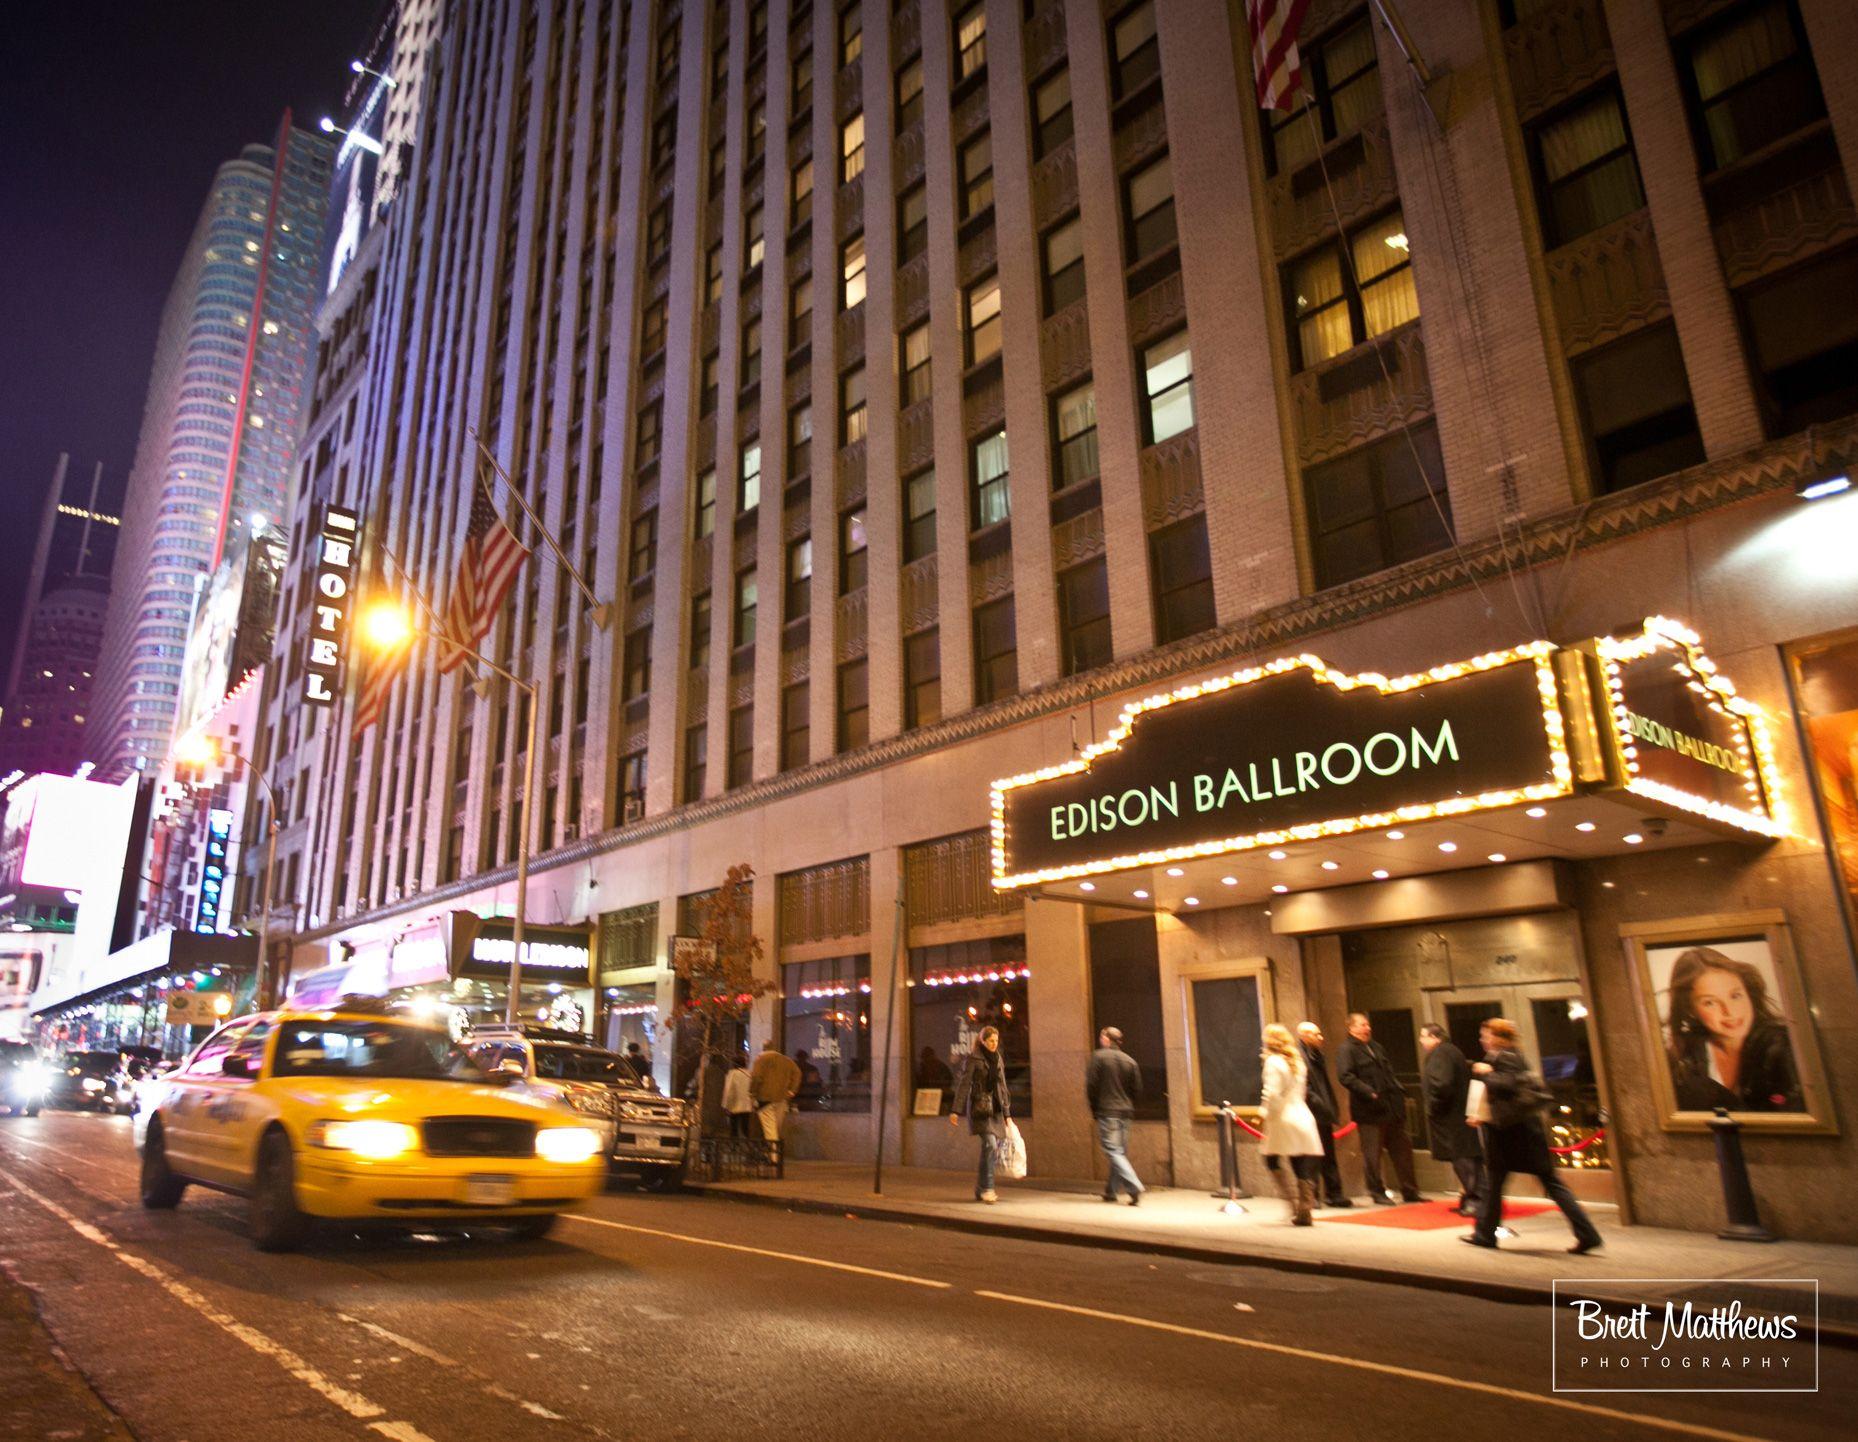 The Edison Ballroom New York Wedding venue costs